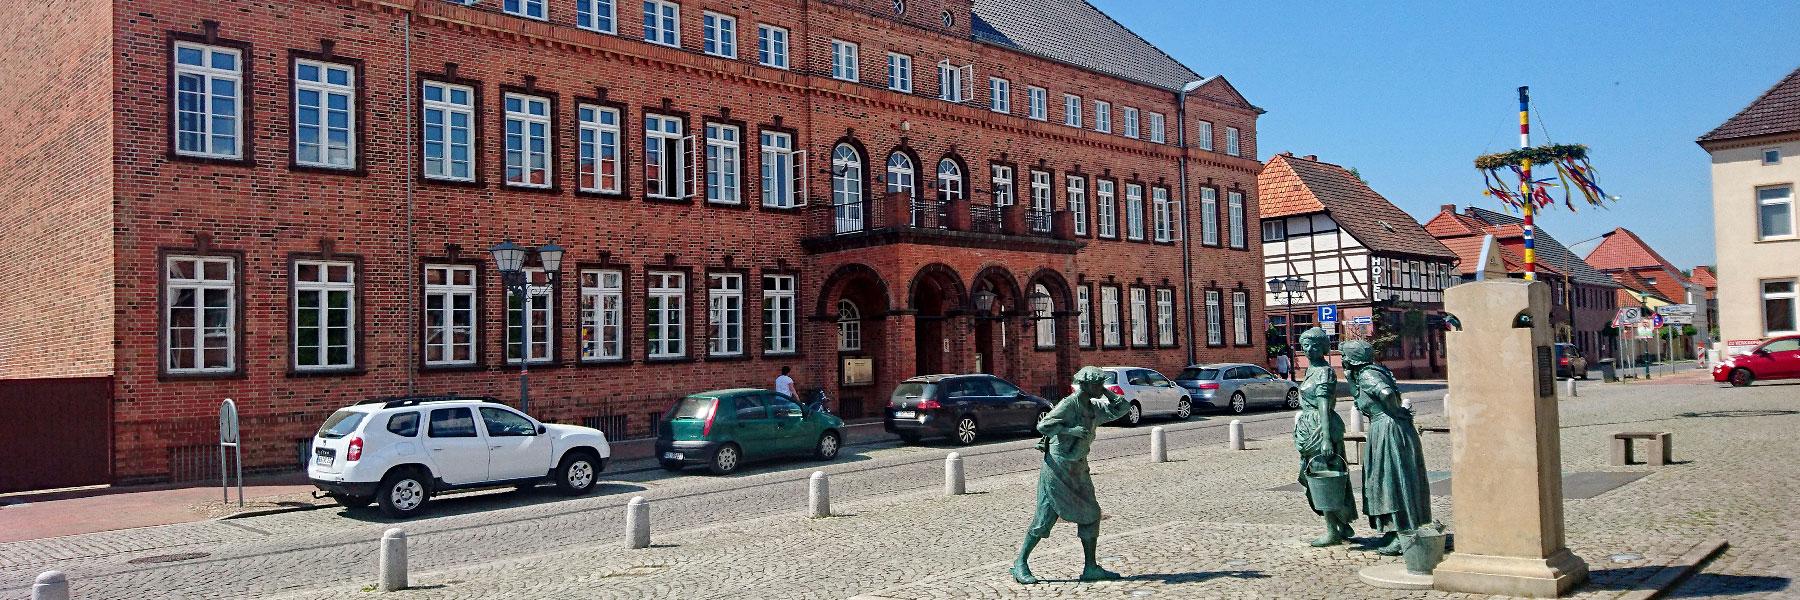 Rathaus - Hagenow